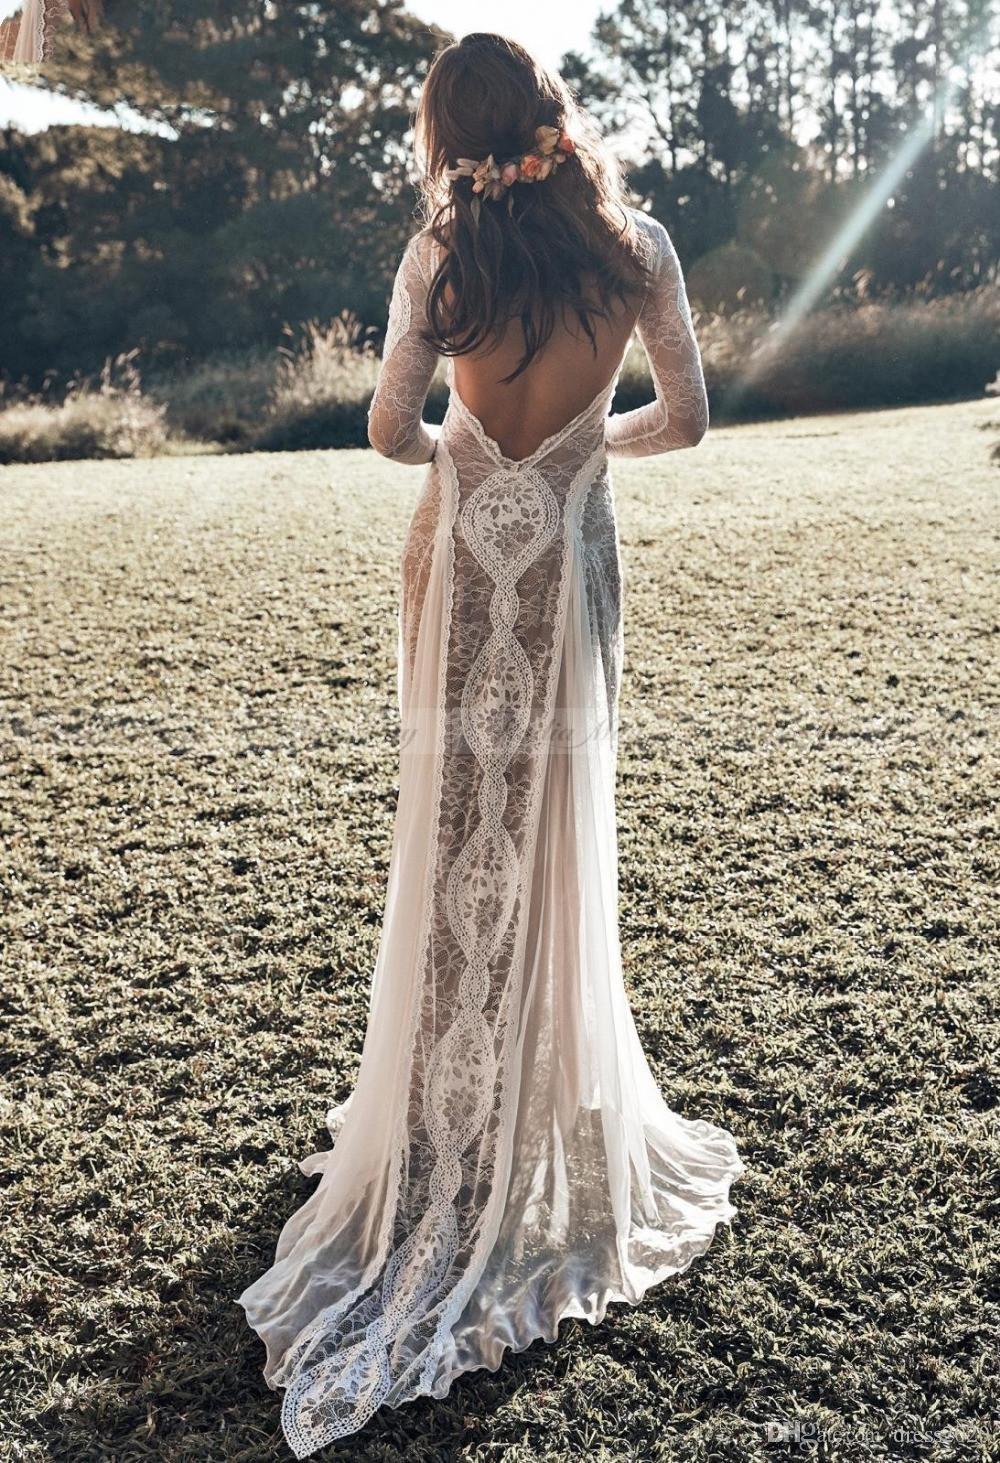 Vintage Lace Backless Boho Beach Vestidos de Noiva de Manga Longa Nude Forro País Boêmio Vestidos de Noiva Hippie Gypsy Noiva Vestido